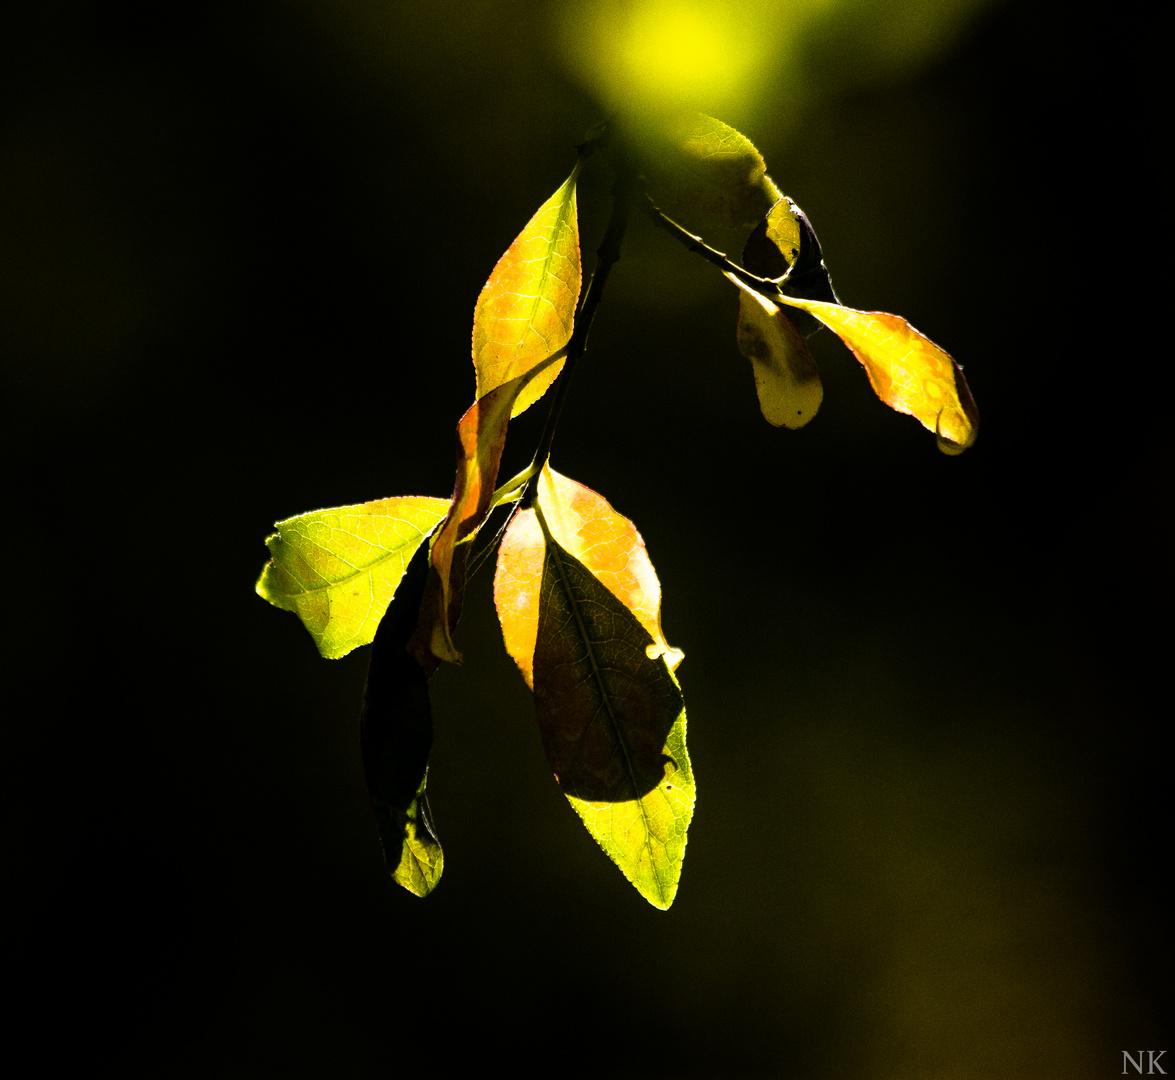 Diedersdorfer Blätter